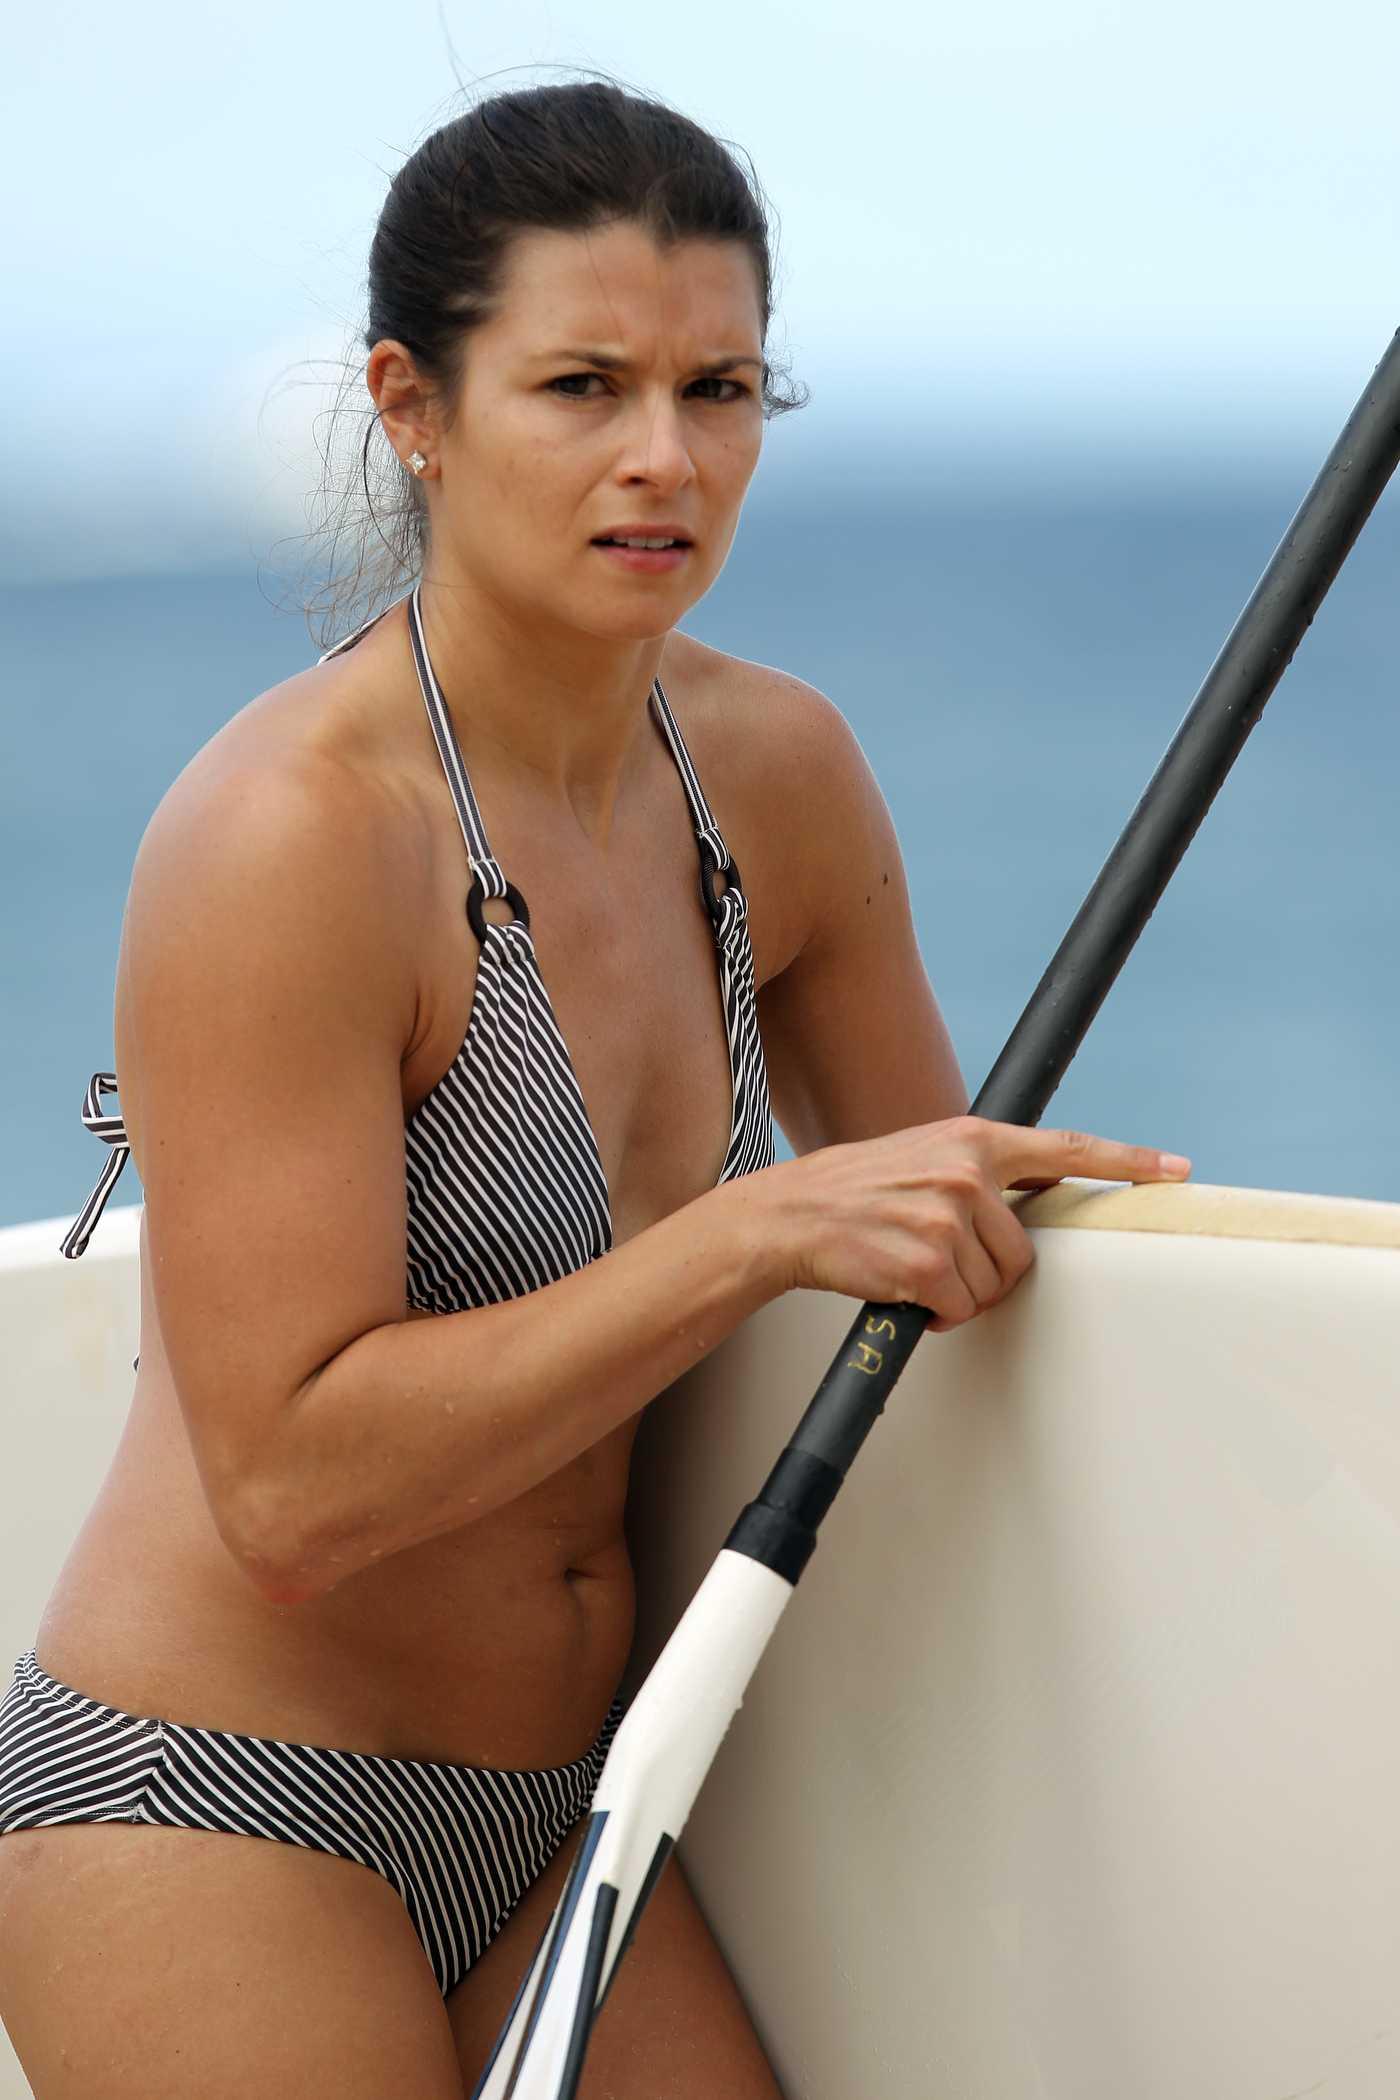 Danica Patrick Bikini Candids in Hawaii